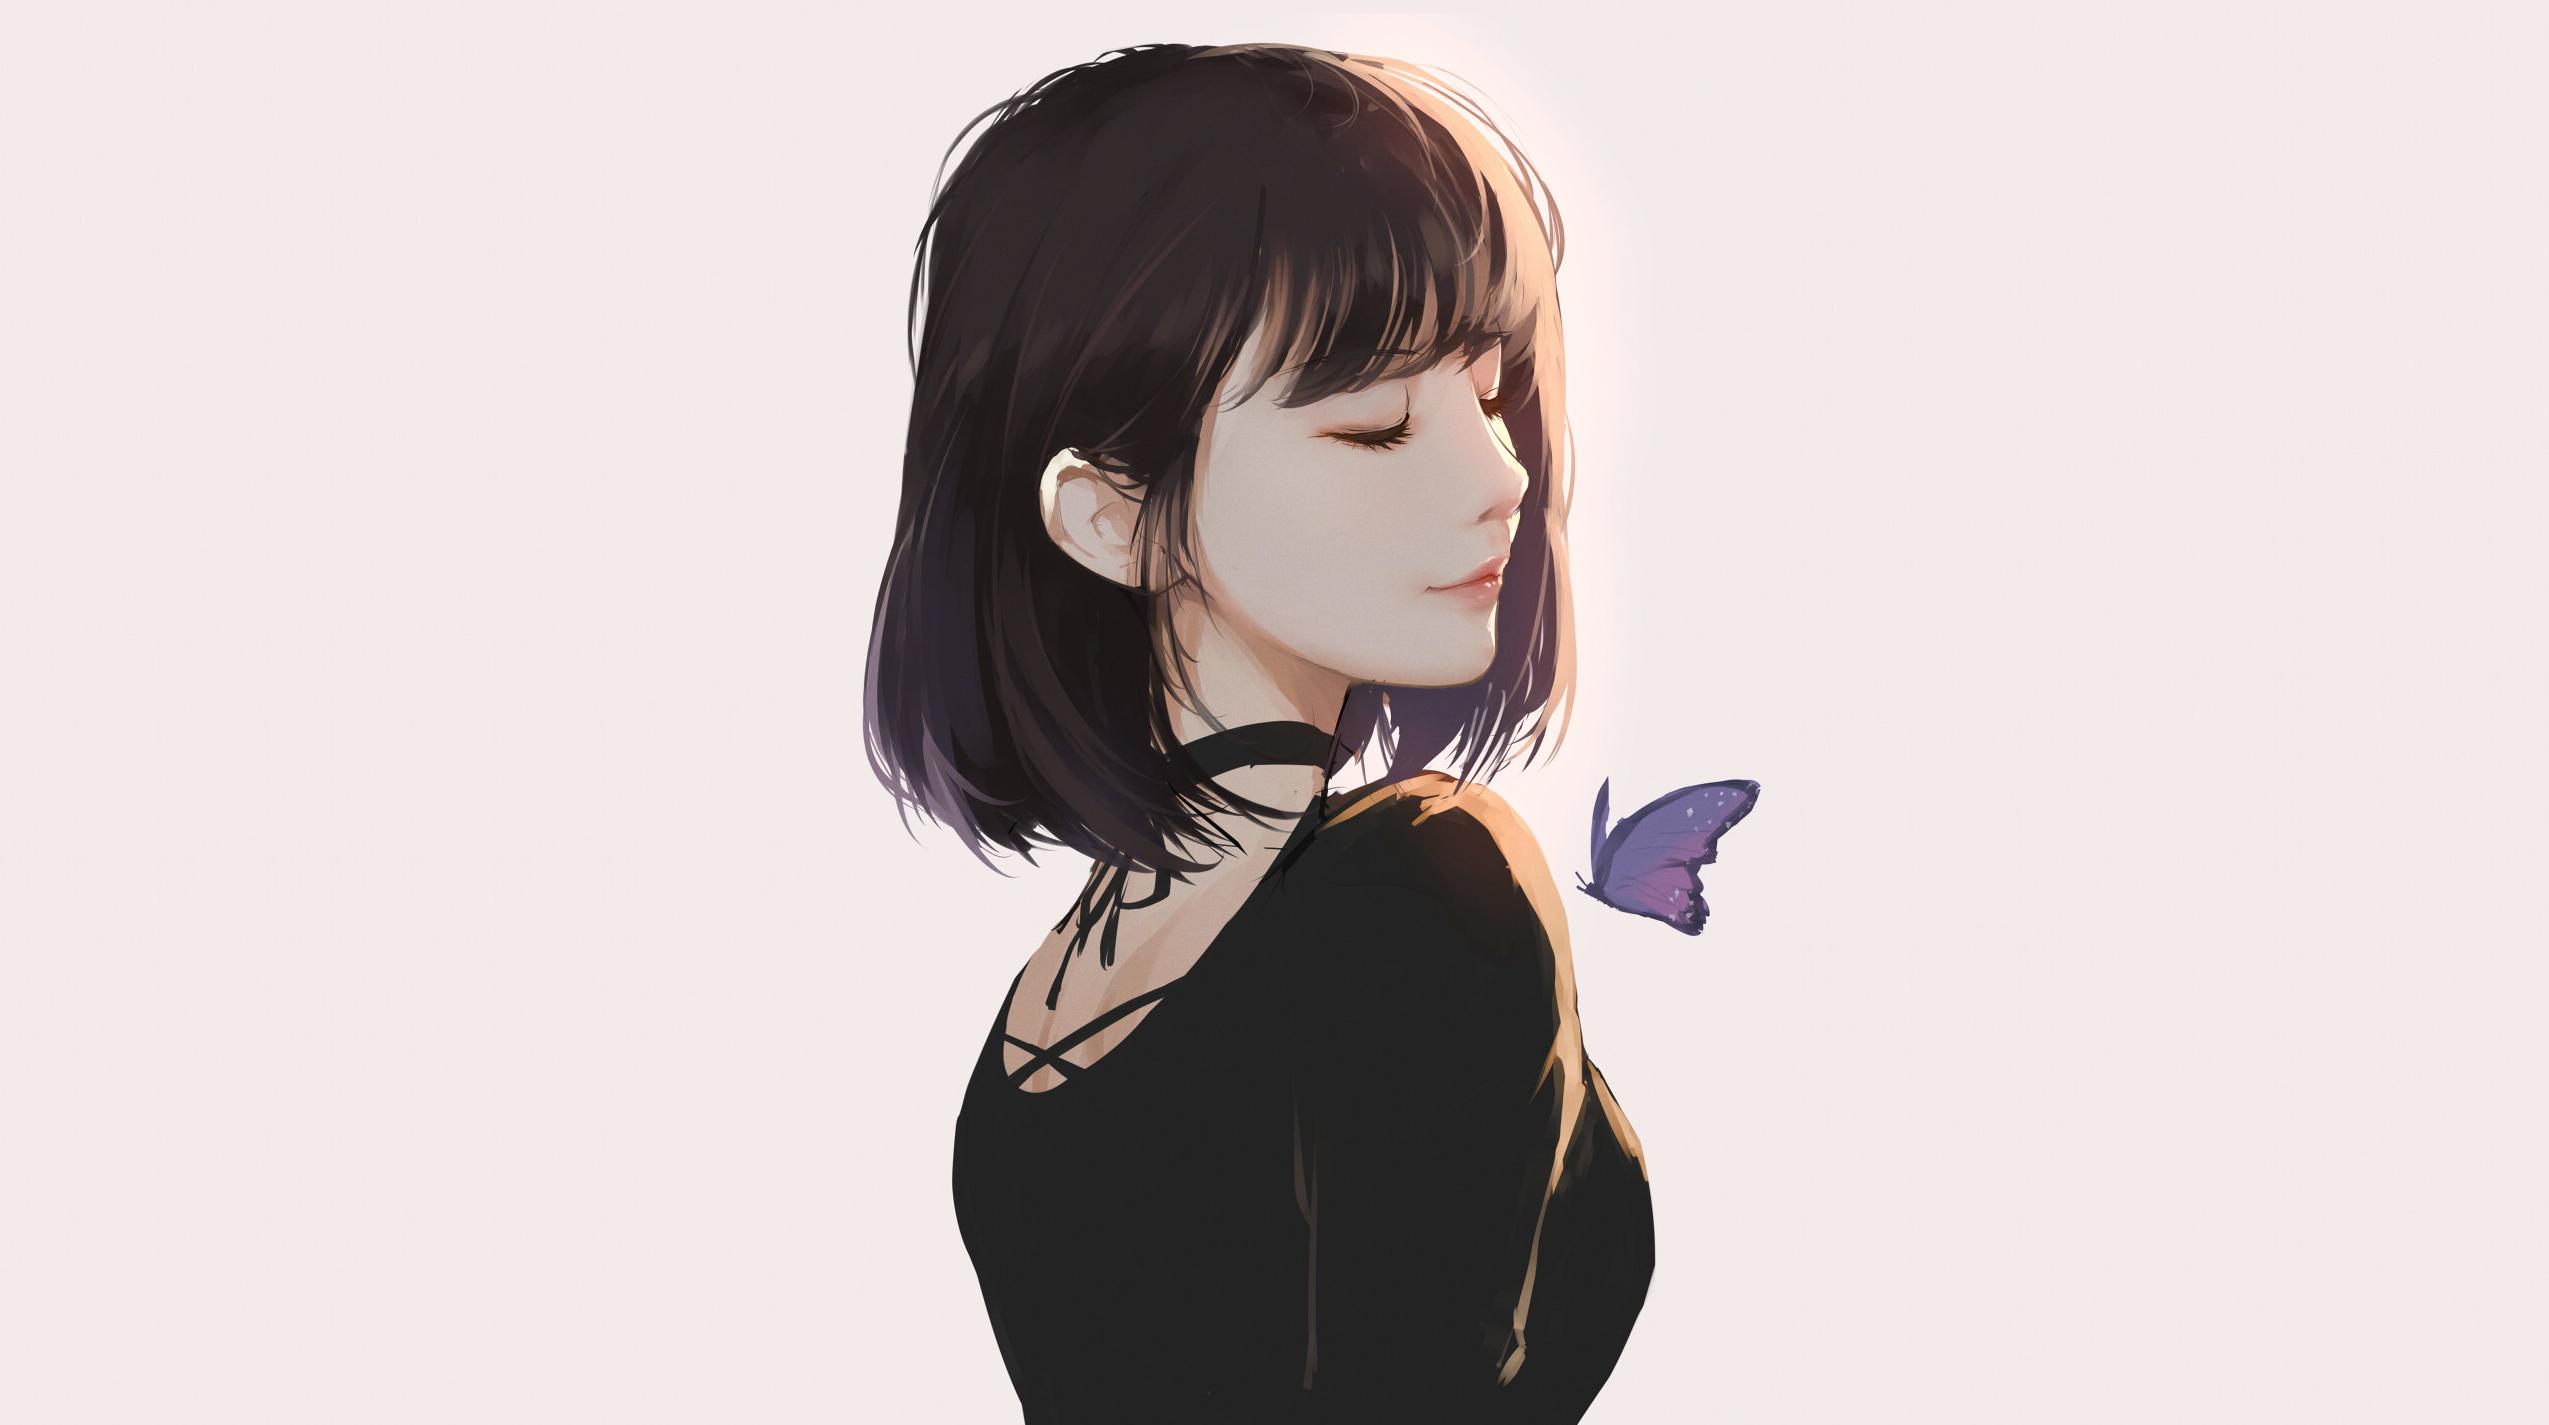 Anime 2549x1425 Caidychen artwork women butterfly short hair brunette closed eyes KD Chen